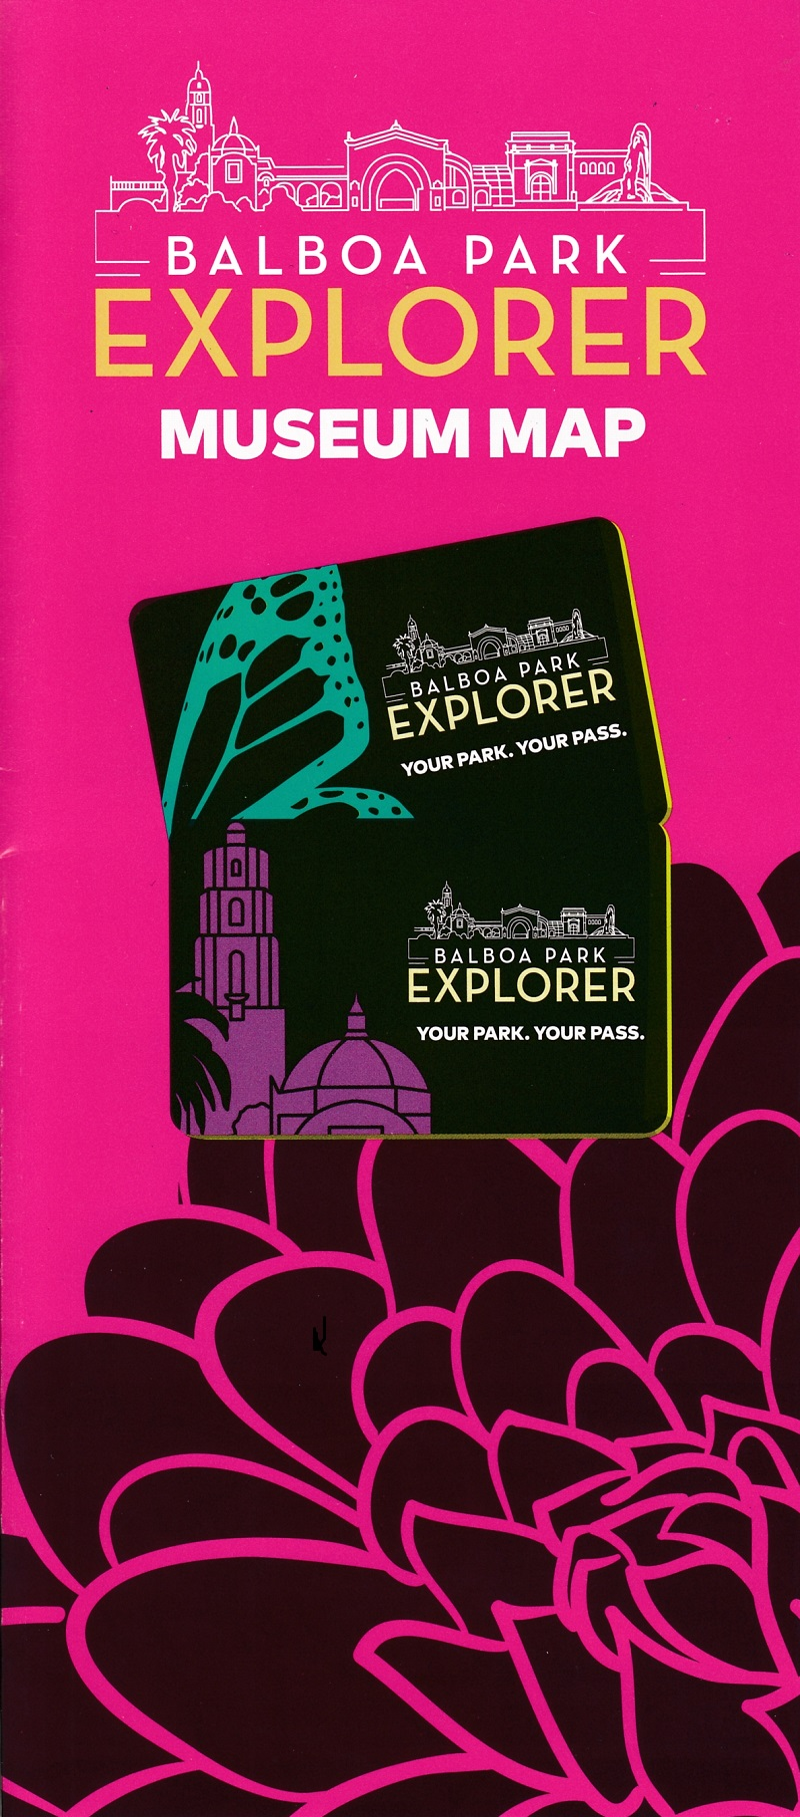 Balboa Park Explorer Museum Mp brochure thumbnail